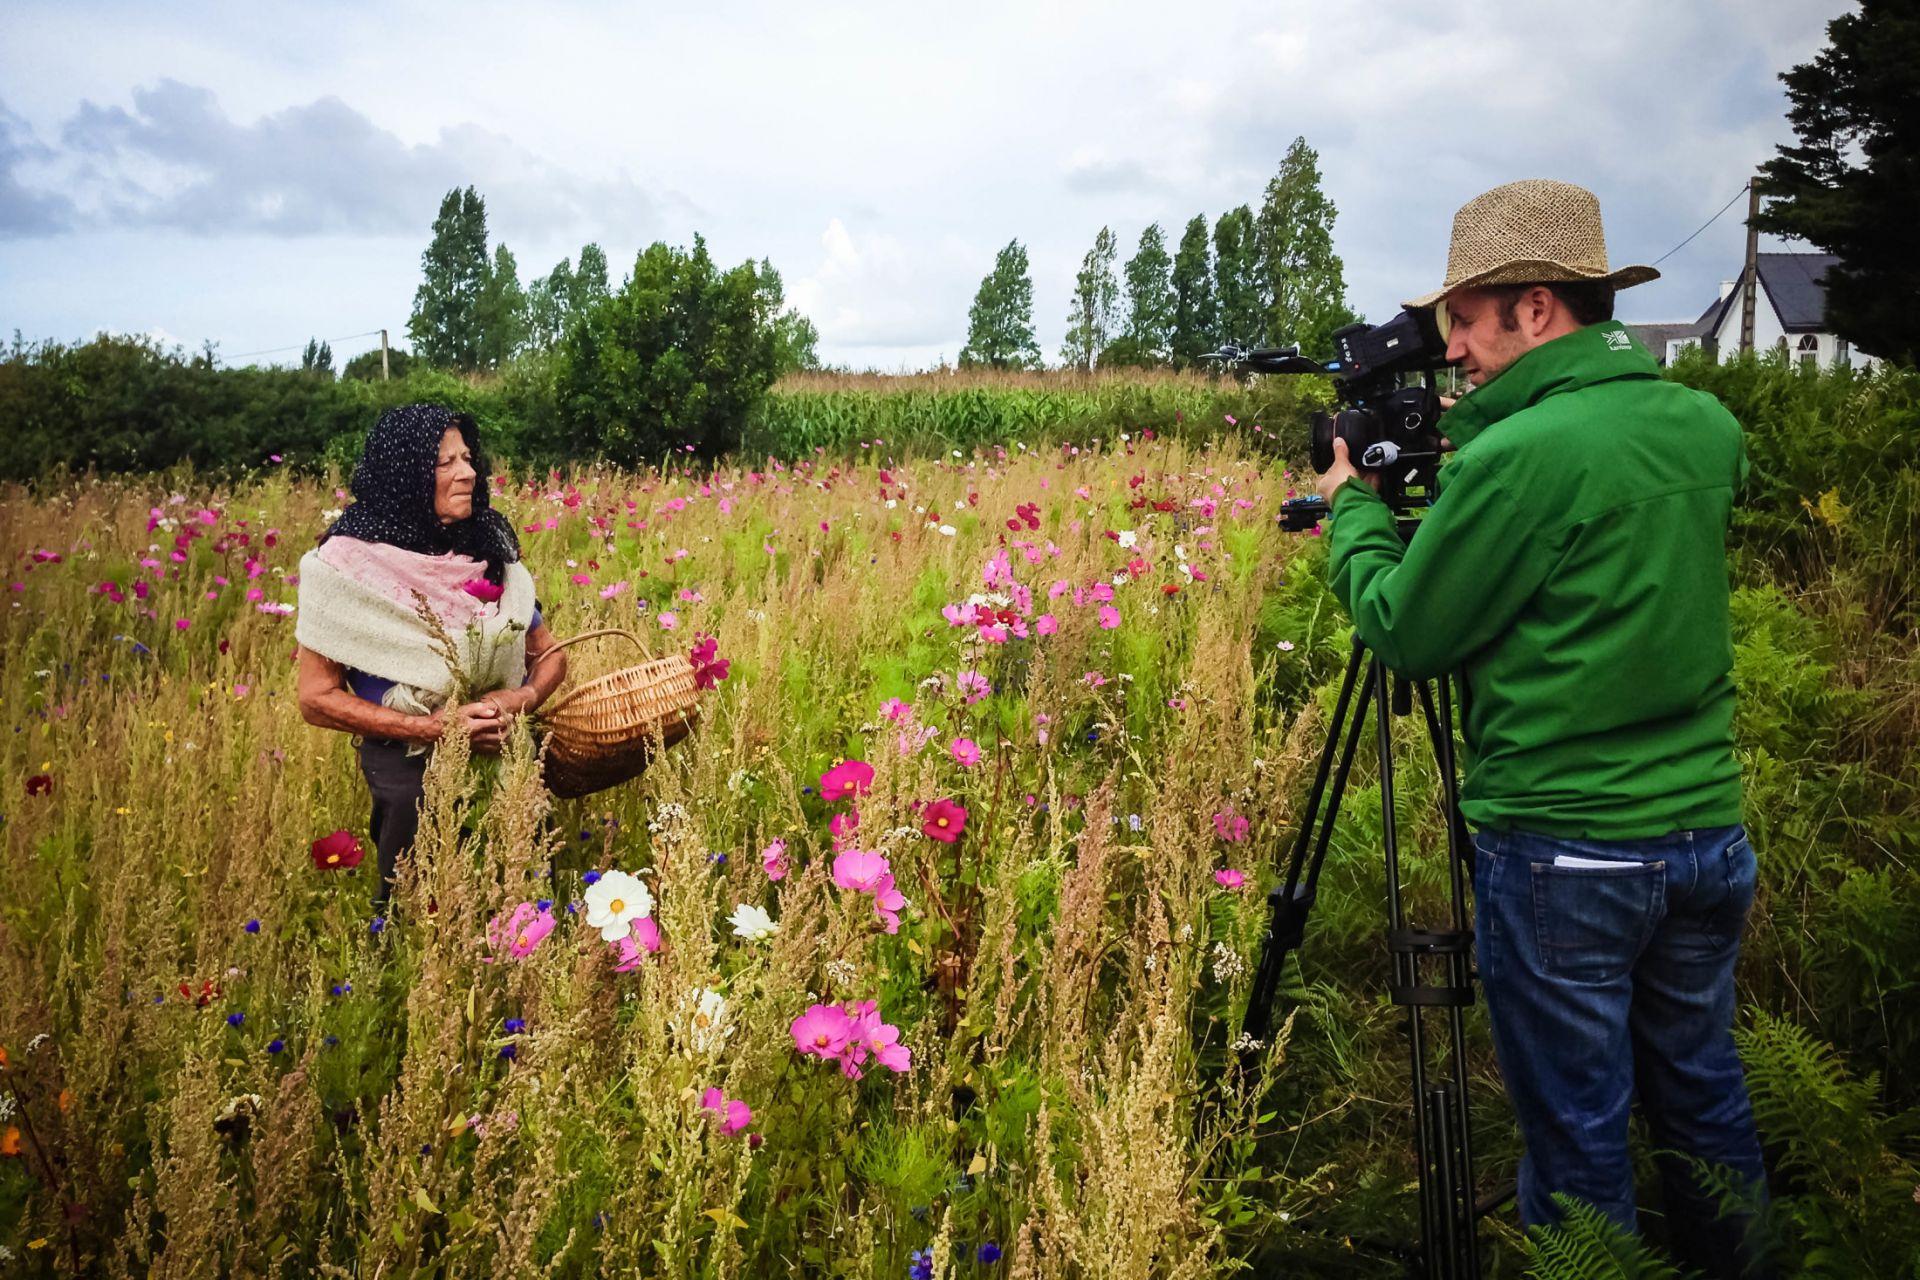 Cameraman filming in garden